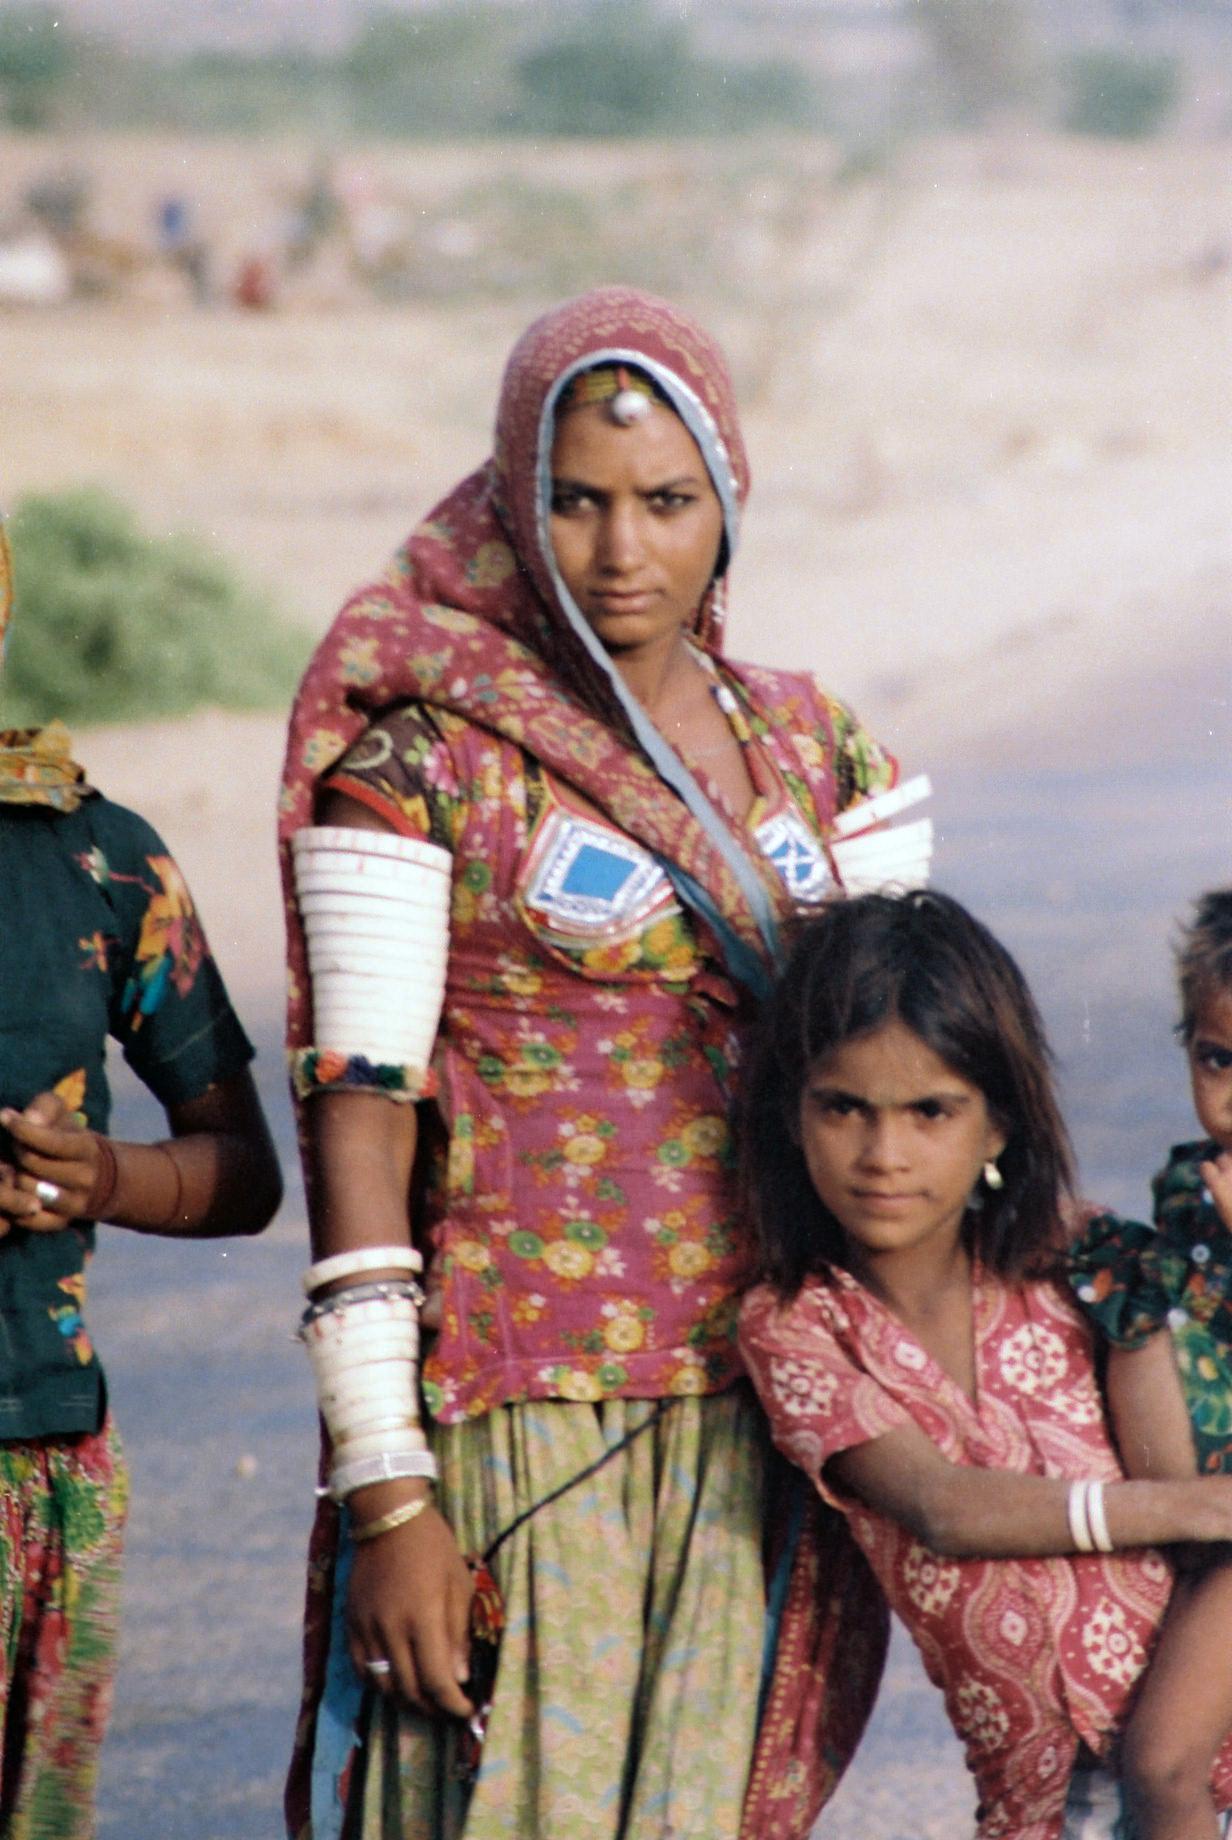 45. Rajasthan desert village